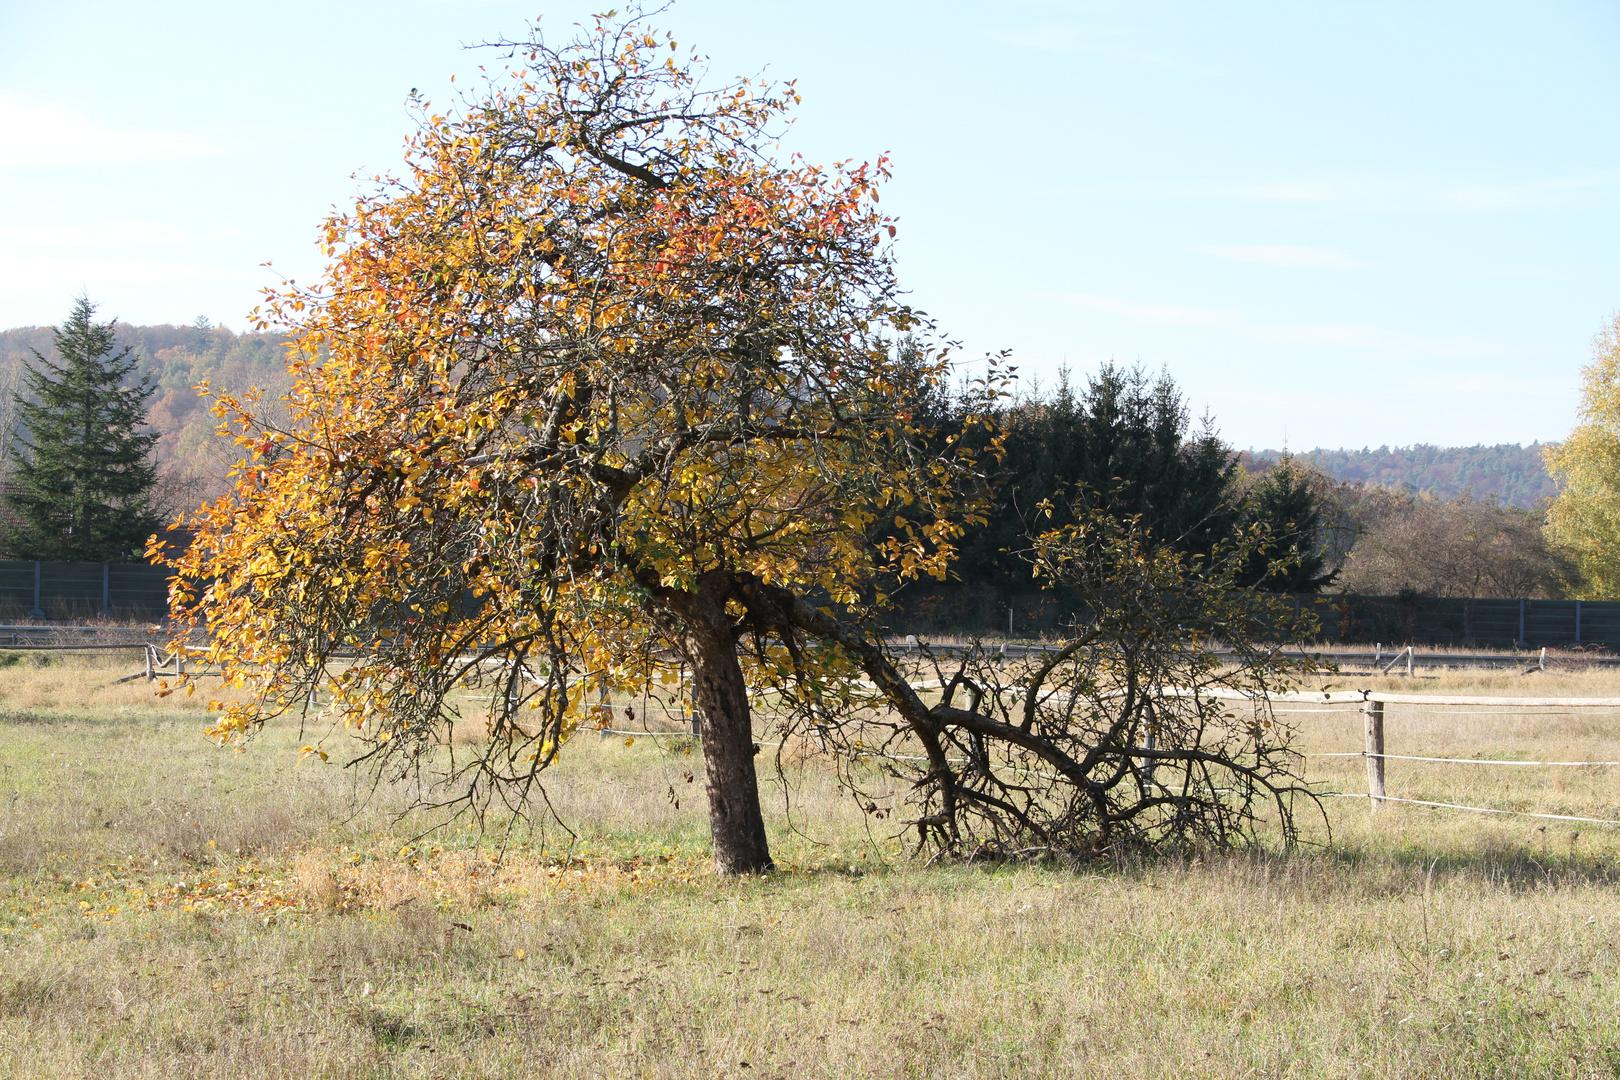 Herbst im Bioasphärenreservat